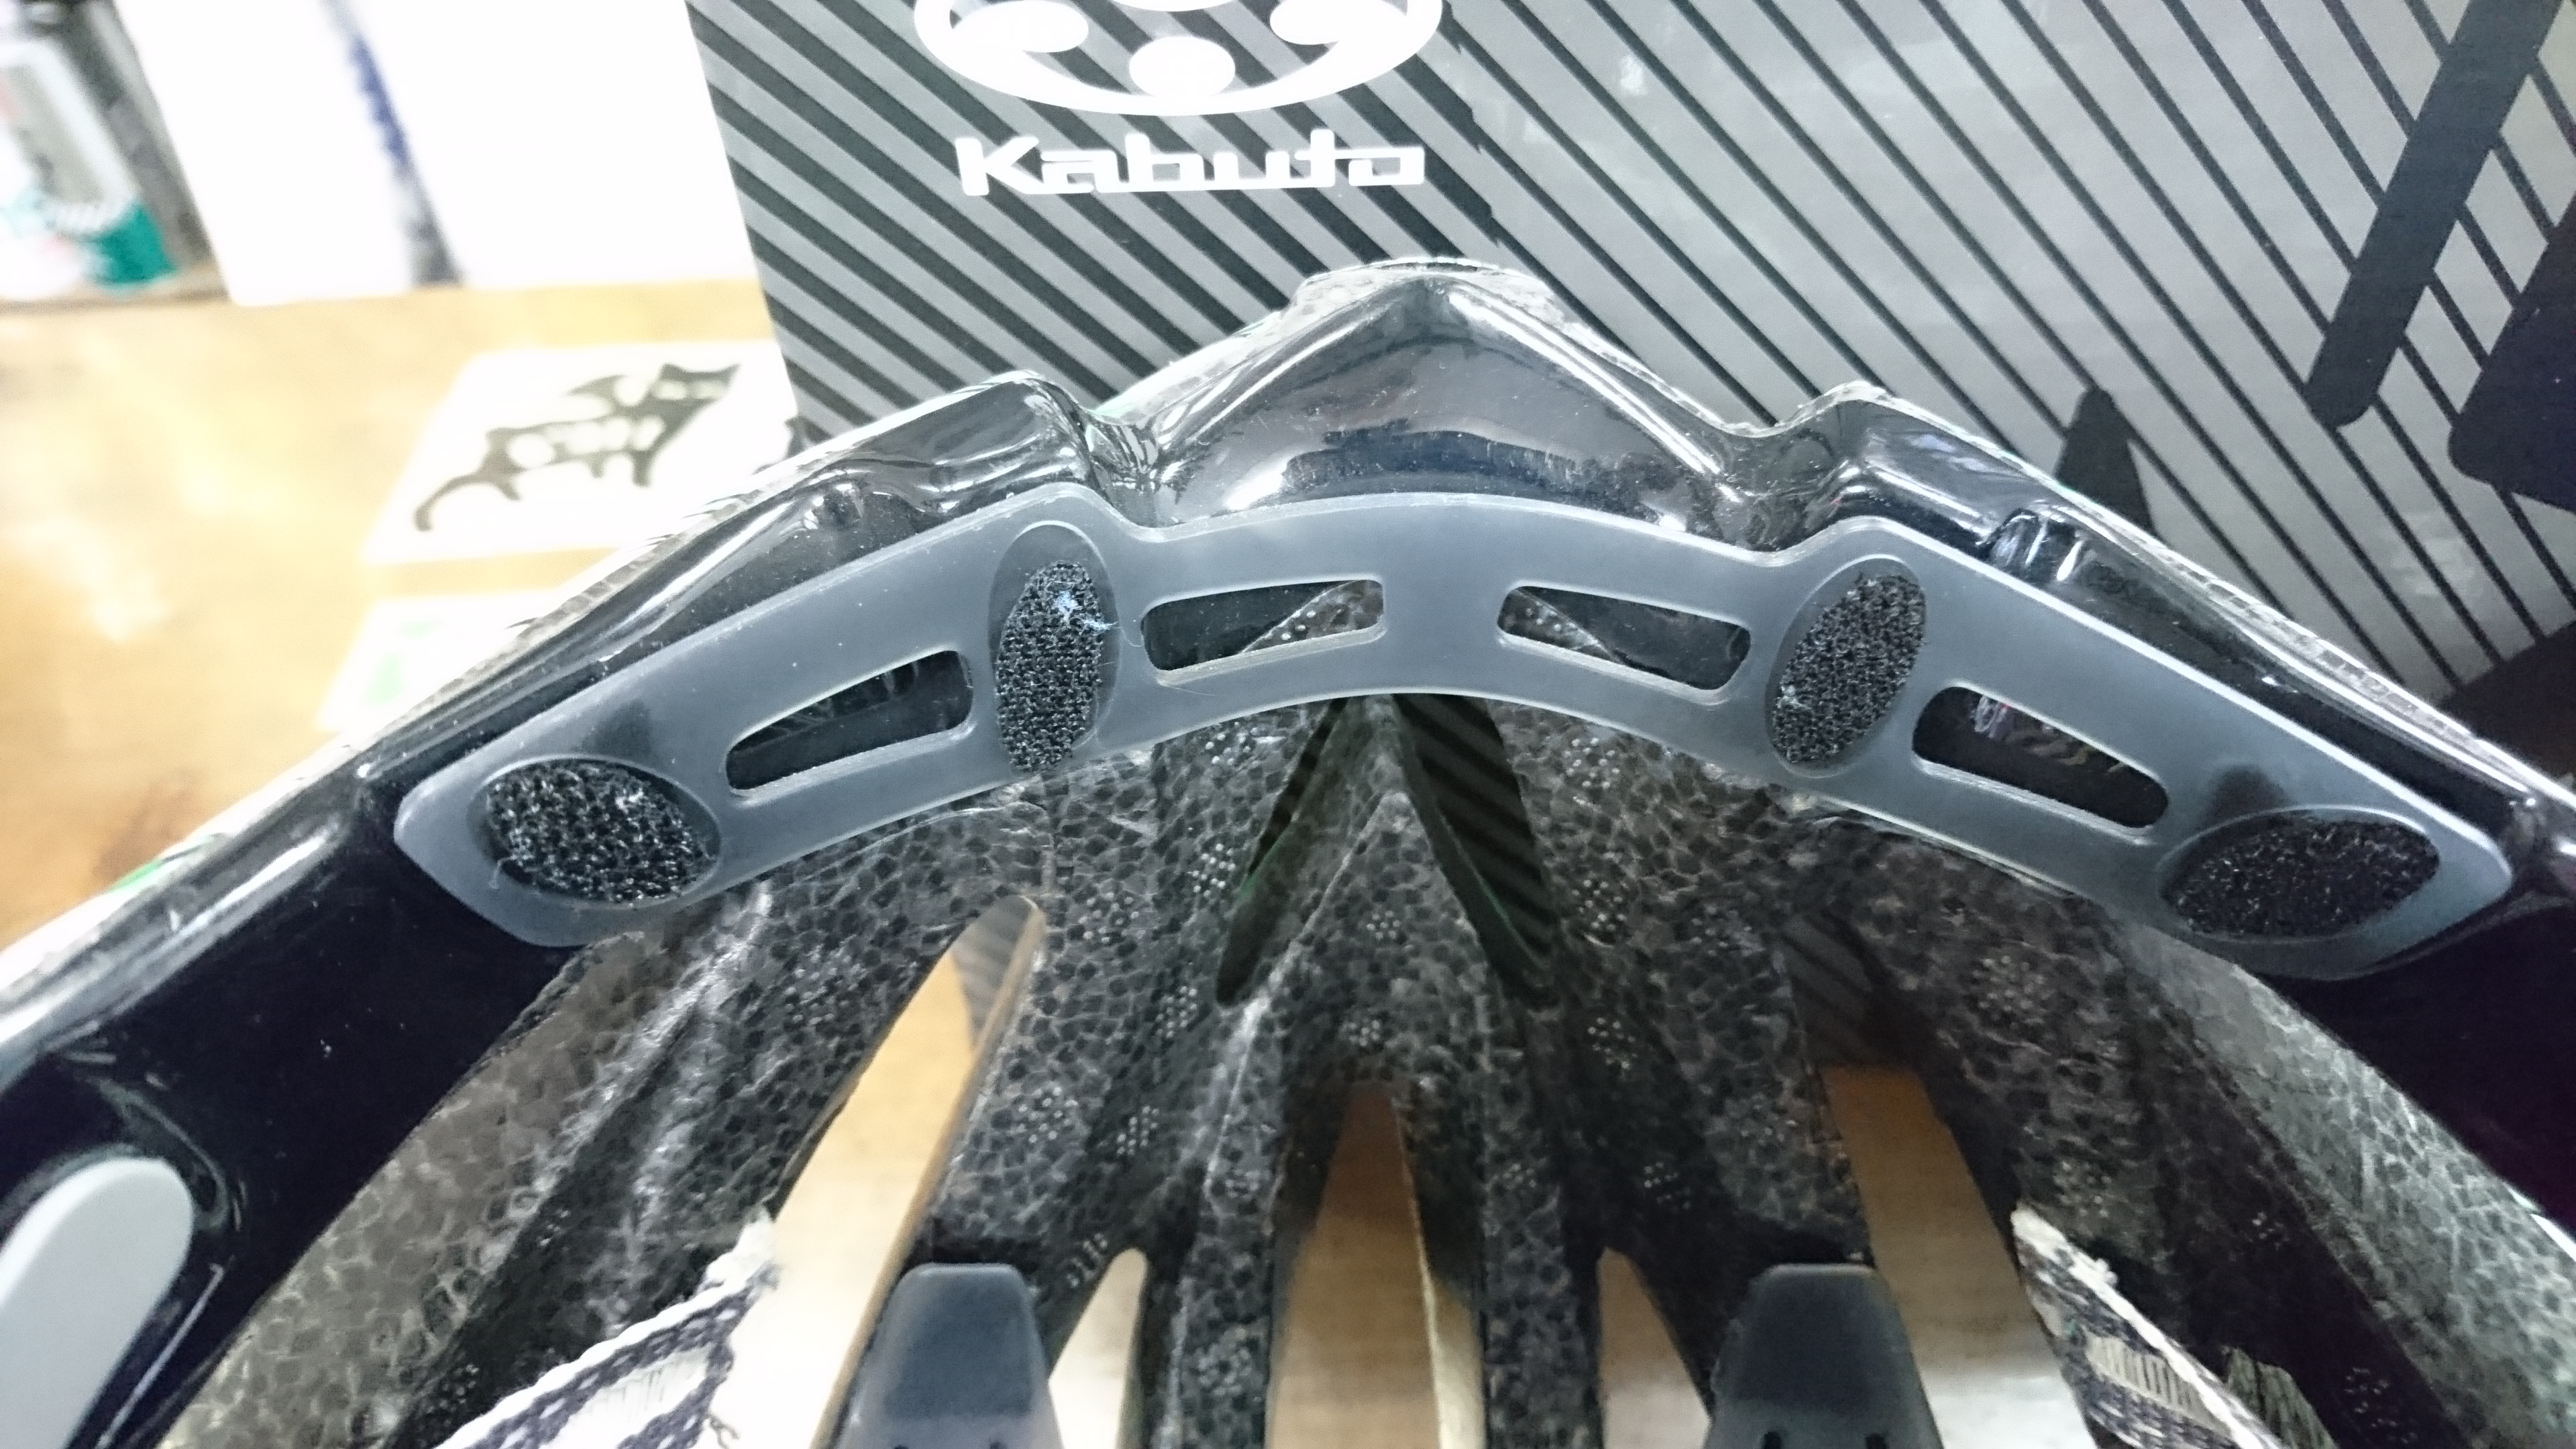 ZENARD-EX Kabuto史上、最高の冷感性能に加え、 新採用のBoa®フィットシステムにより極上のフィット感を実現。